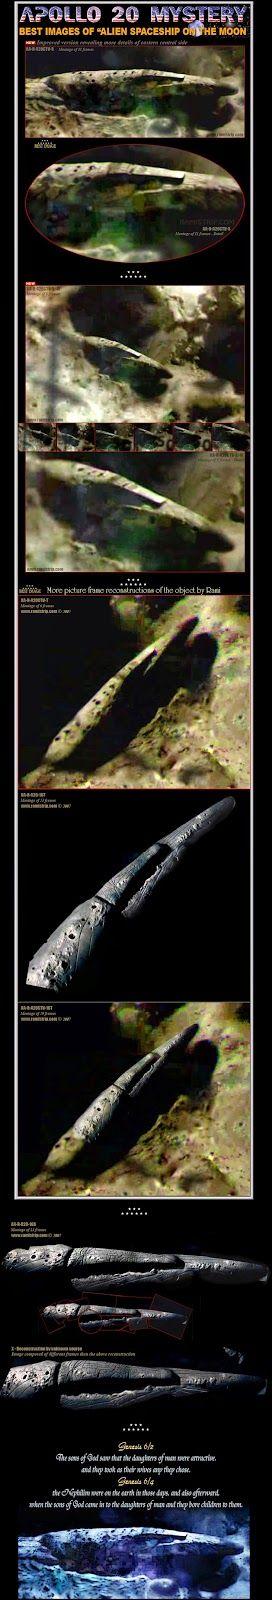 Massive 1.5 Million-Year-Old Cigar UFO On Moon? The Secret Apollo 20 Mission